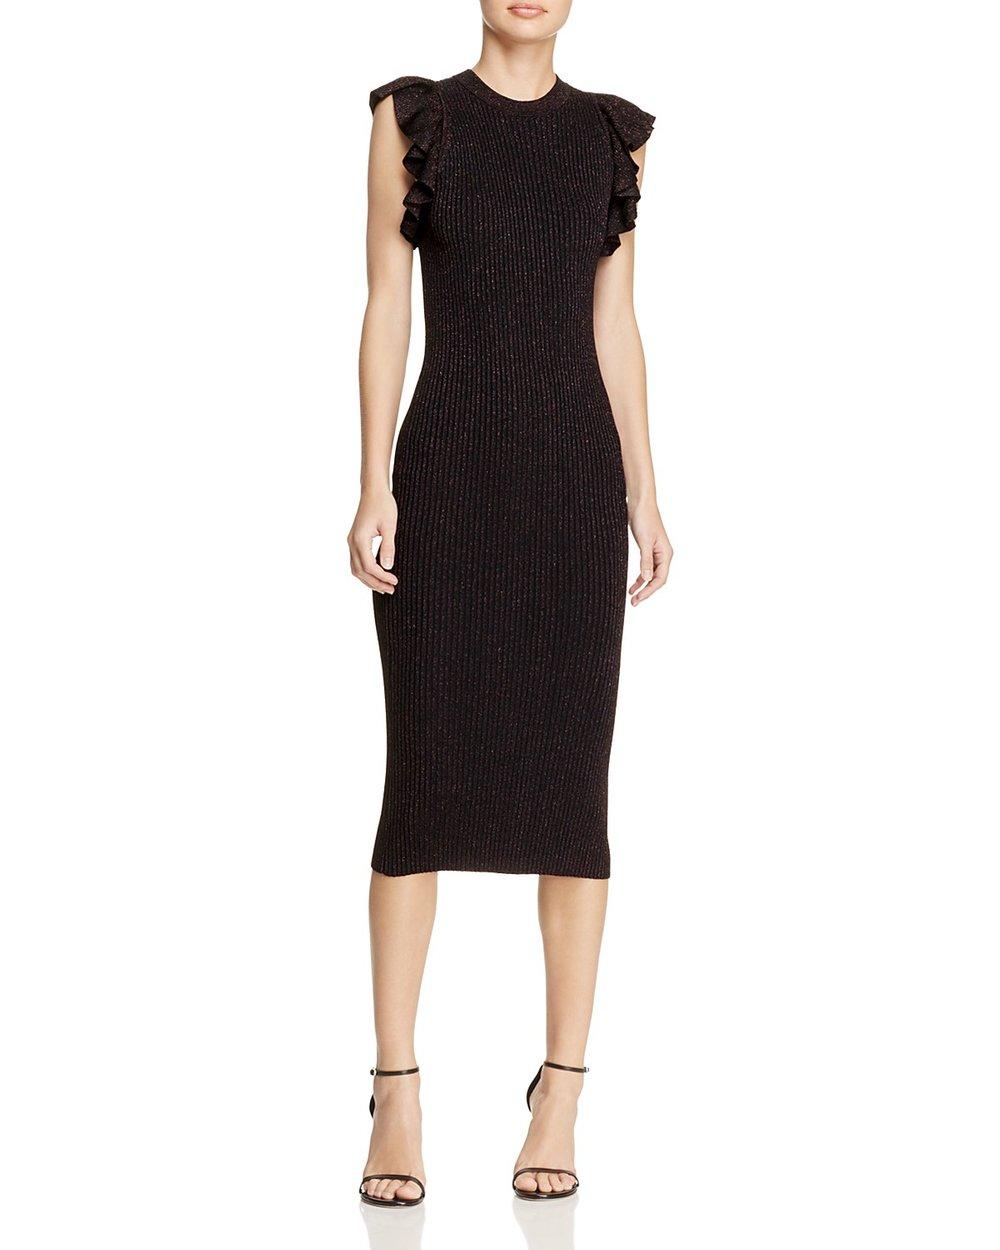 REBECCA MINKOFF Sashi Ruffled Shoulder sweater dress, $156 Bloomingdales.com